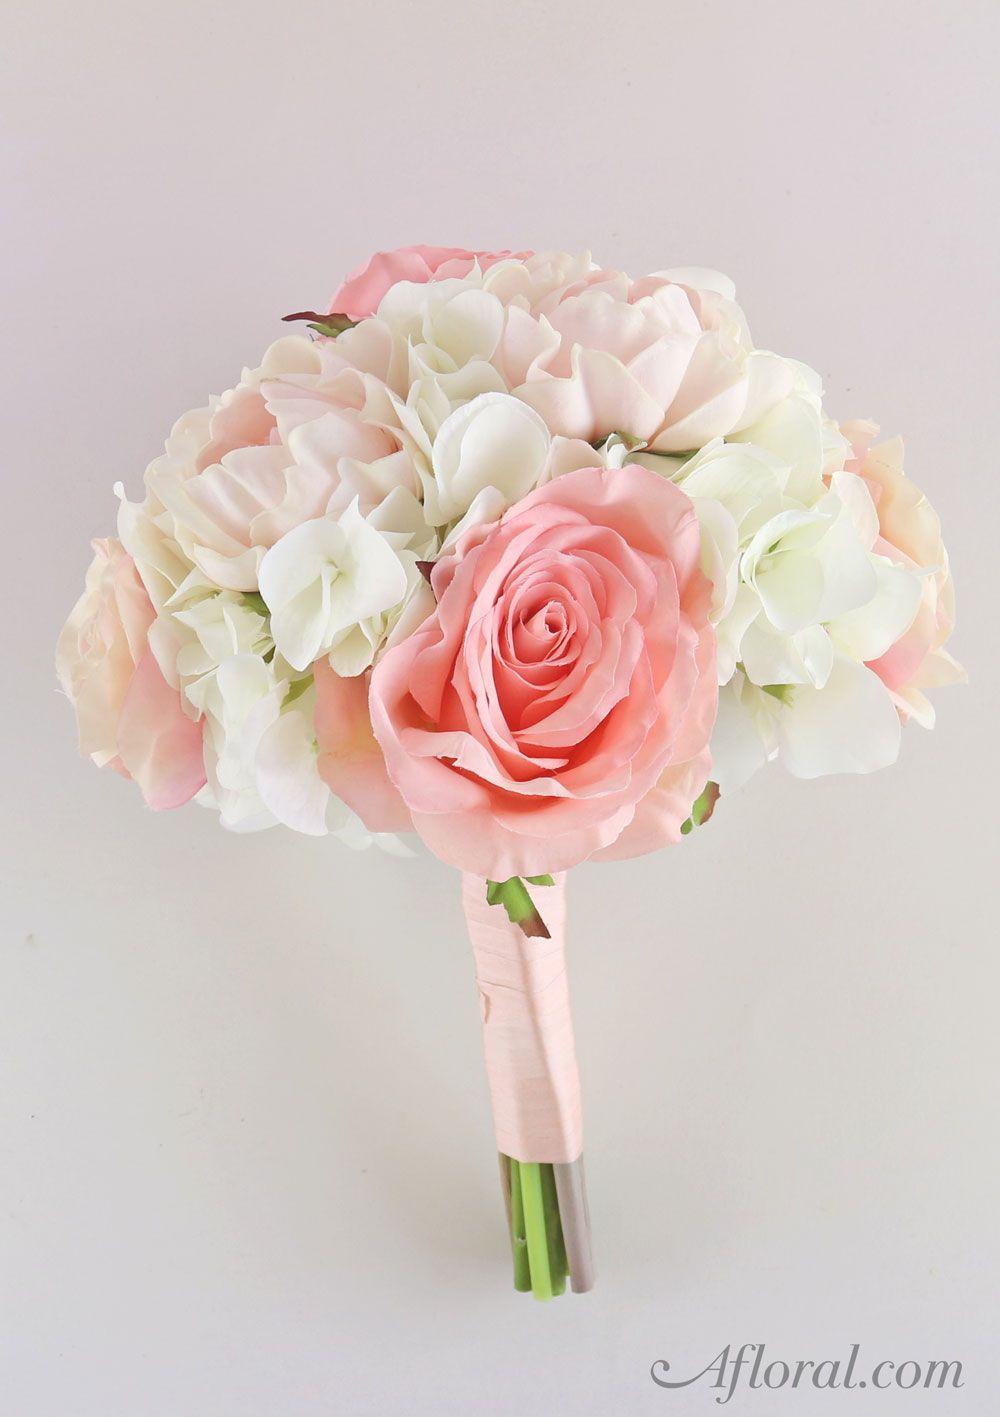 Making Your Own Wedding Bouquet With Silk Flowers Deweddingjpg